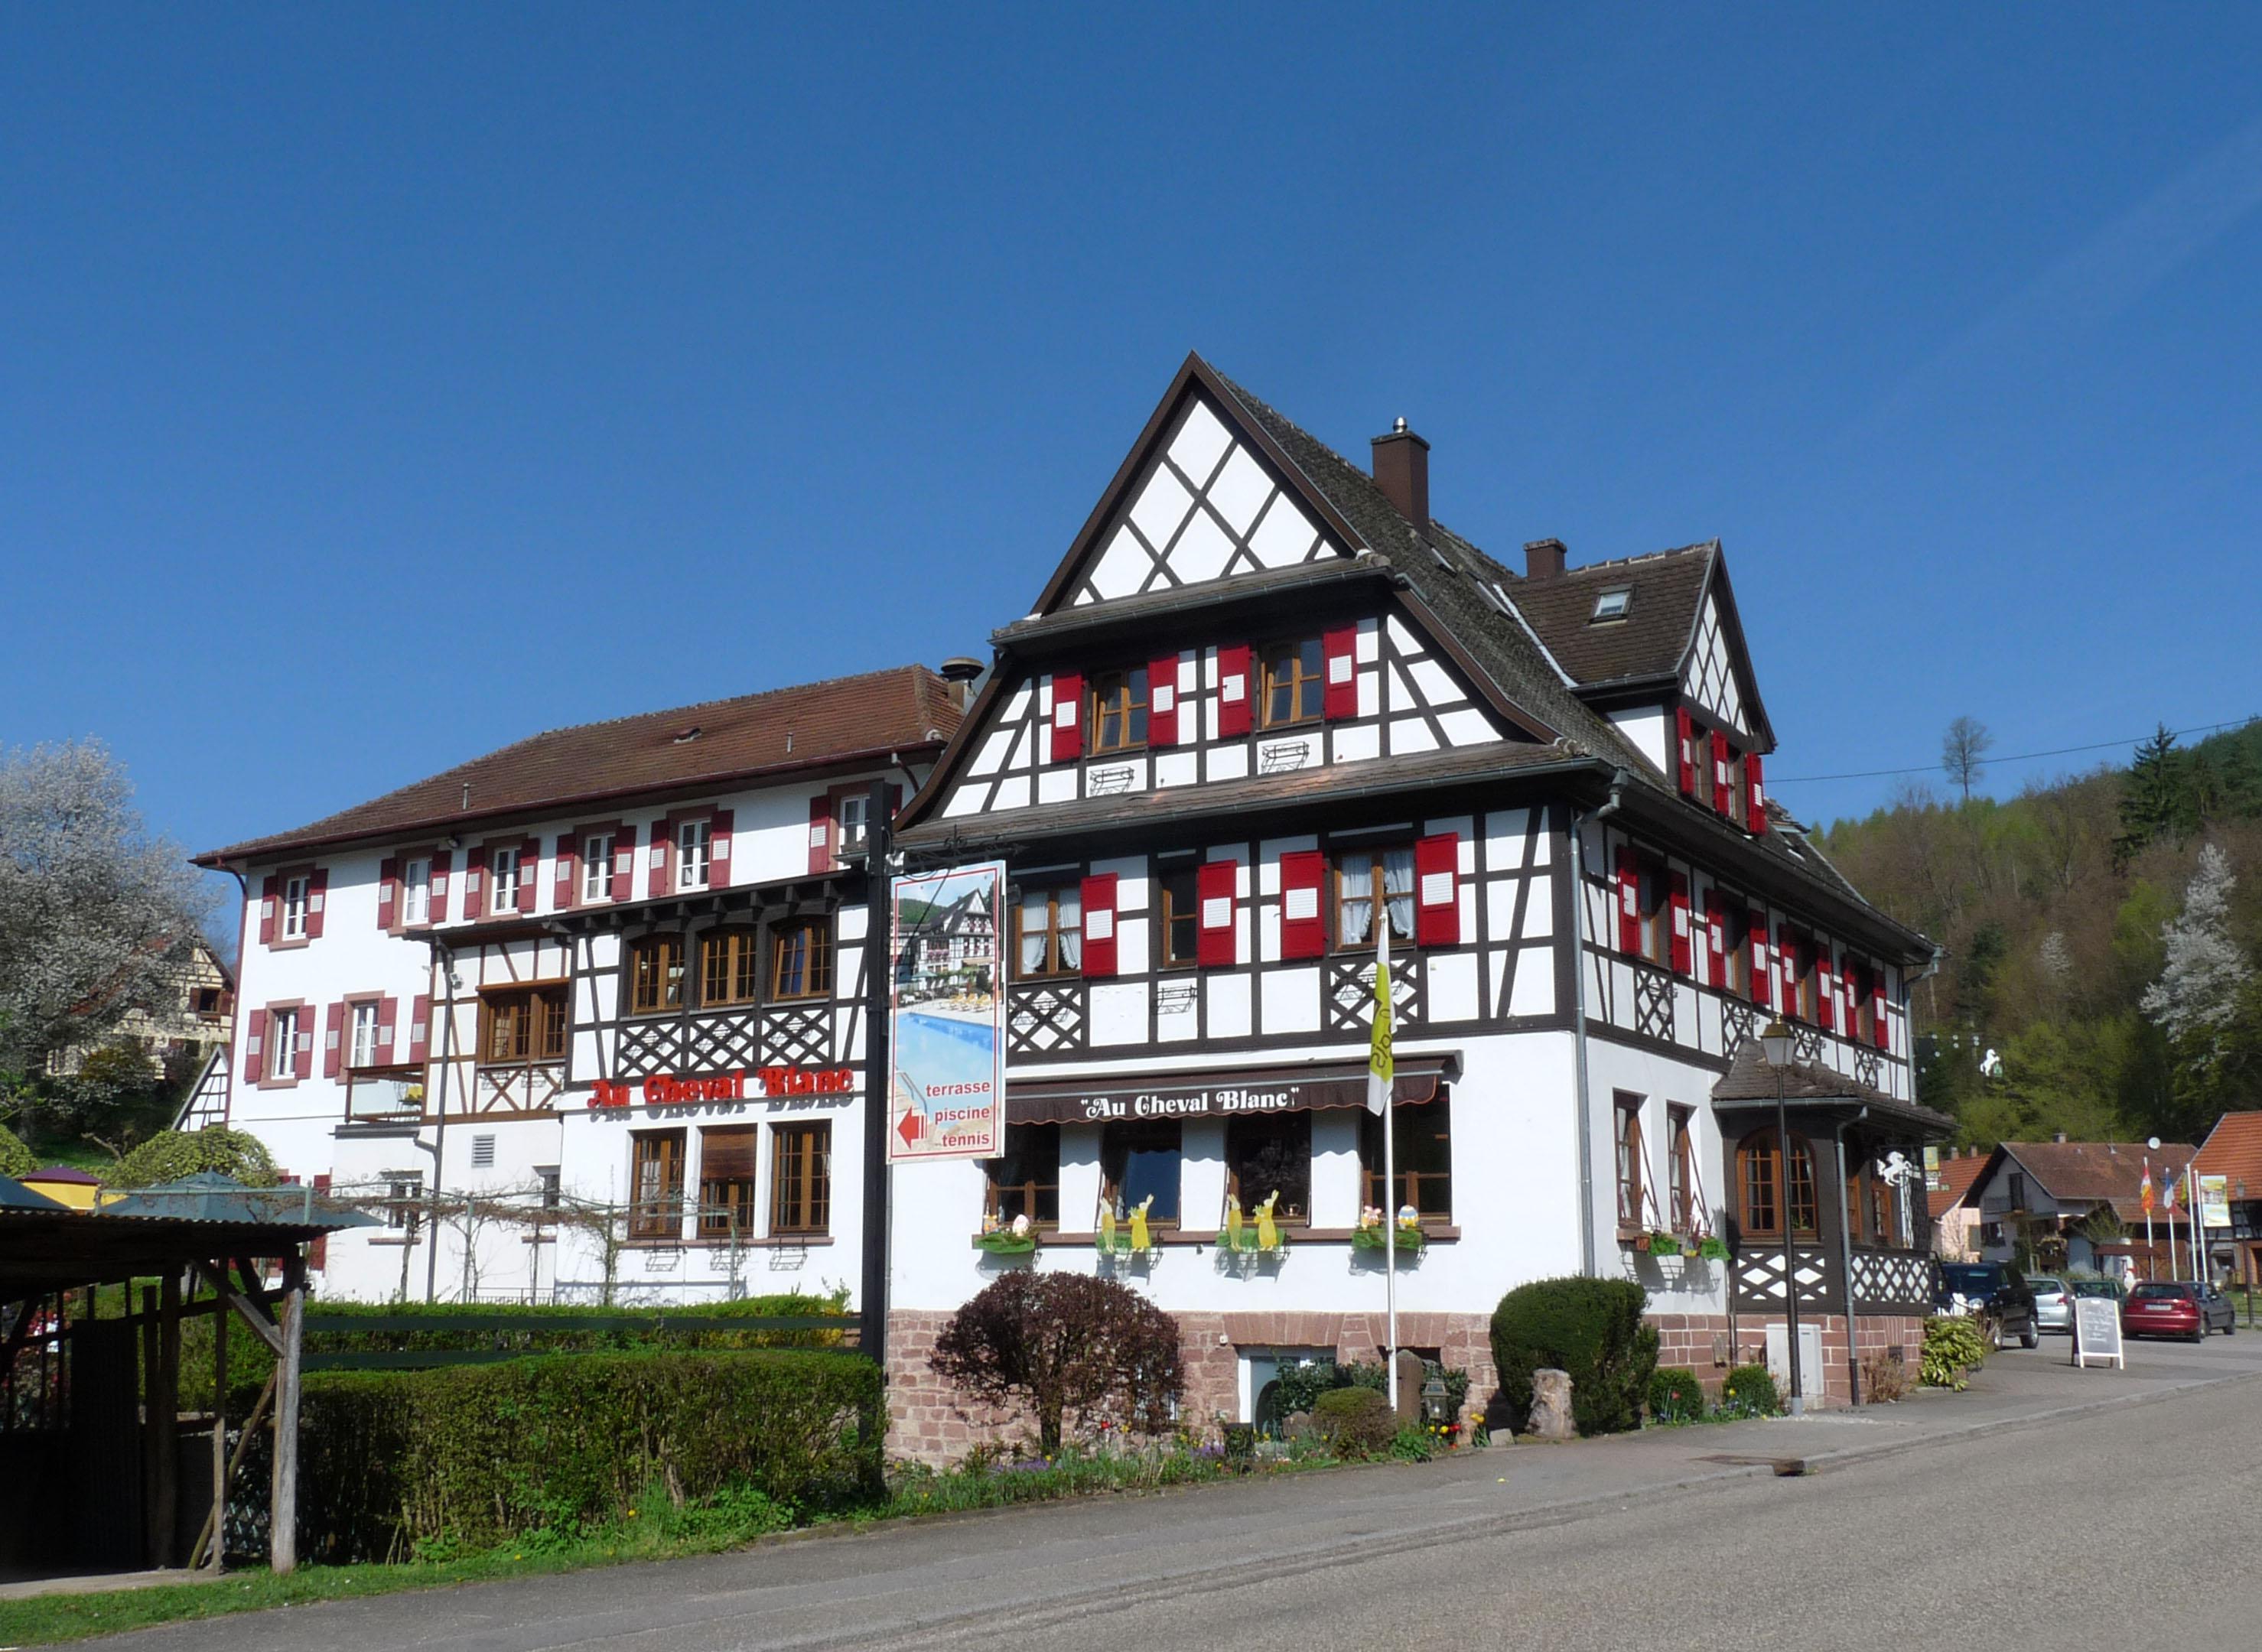 Hotel Restaurant Le Monarque Blois